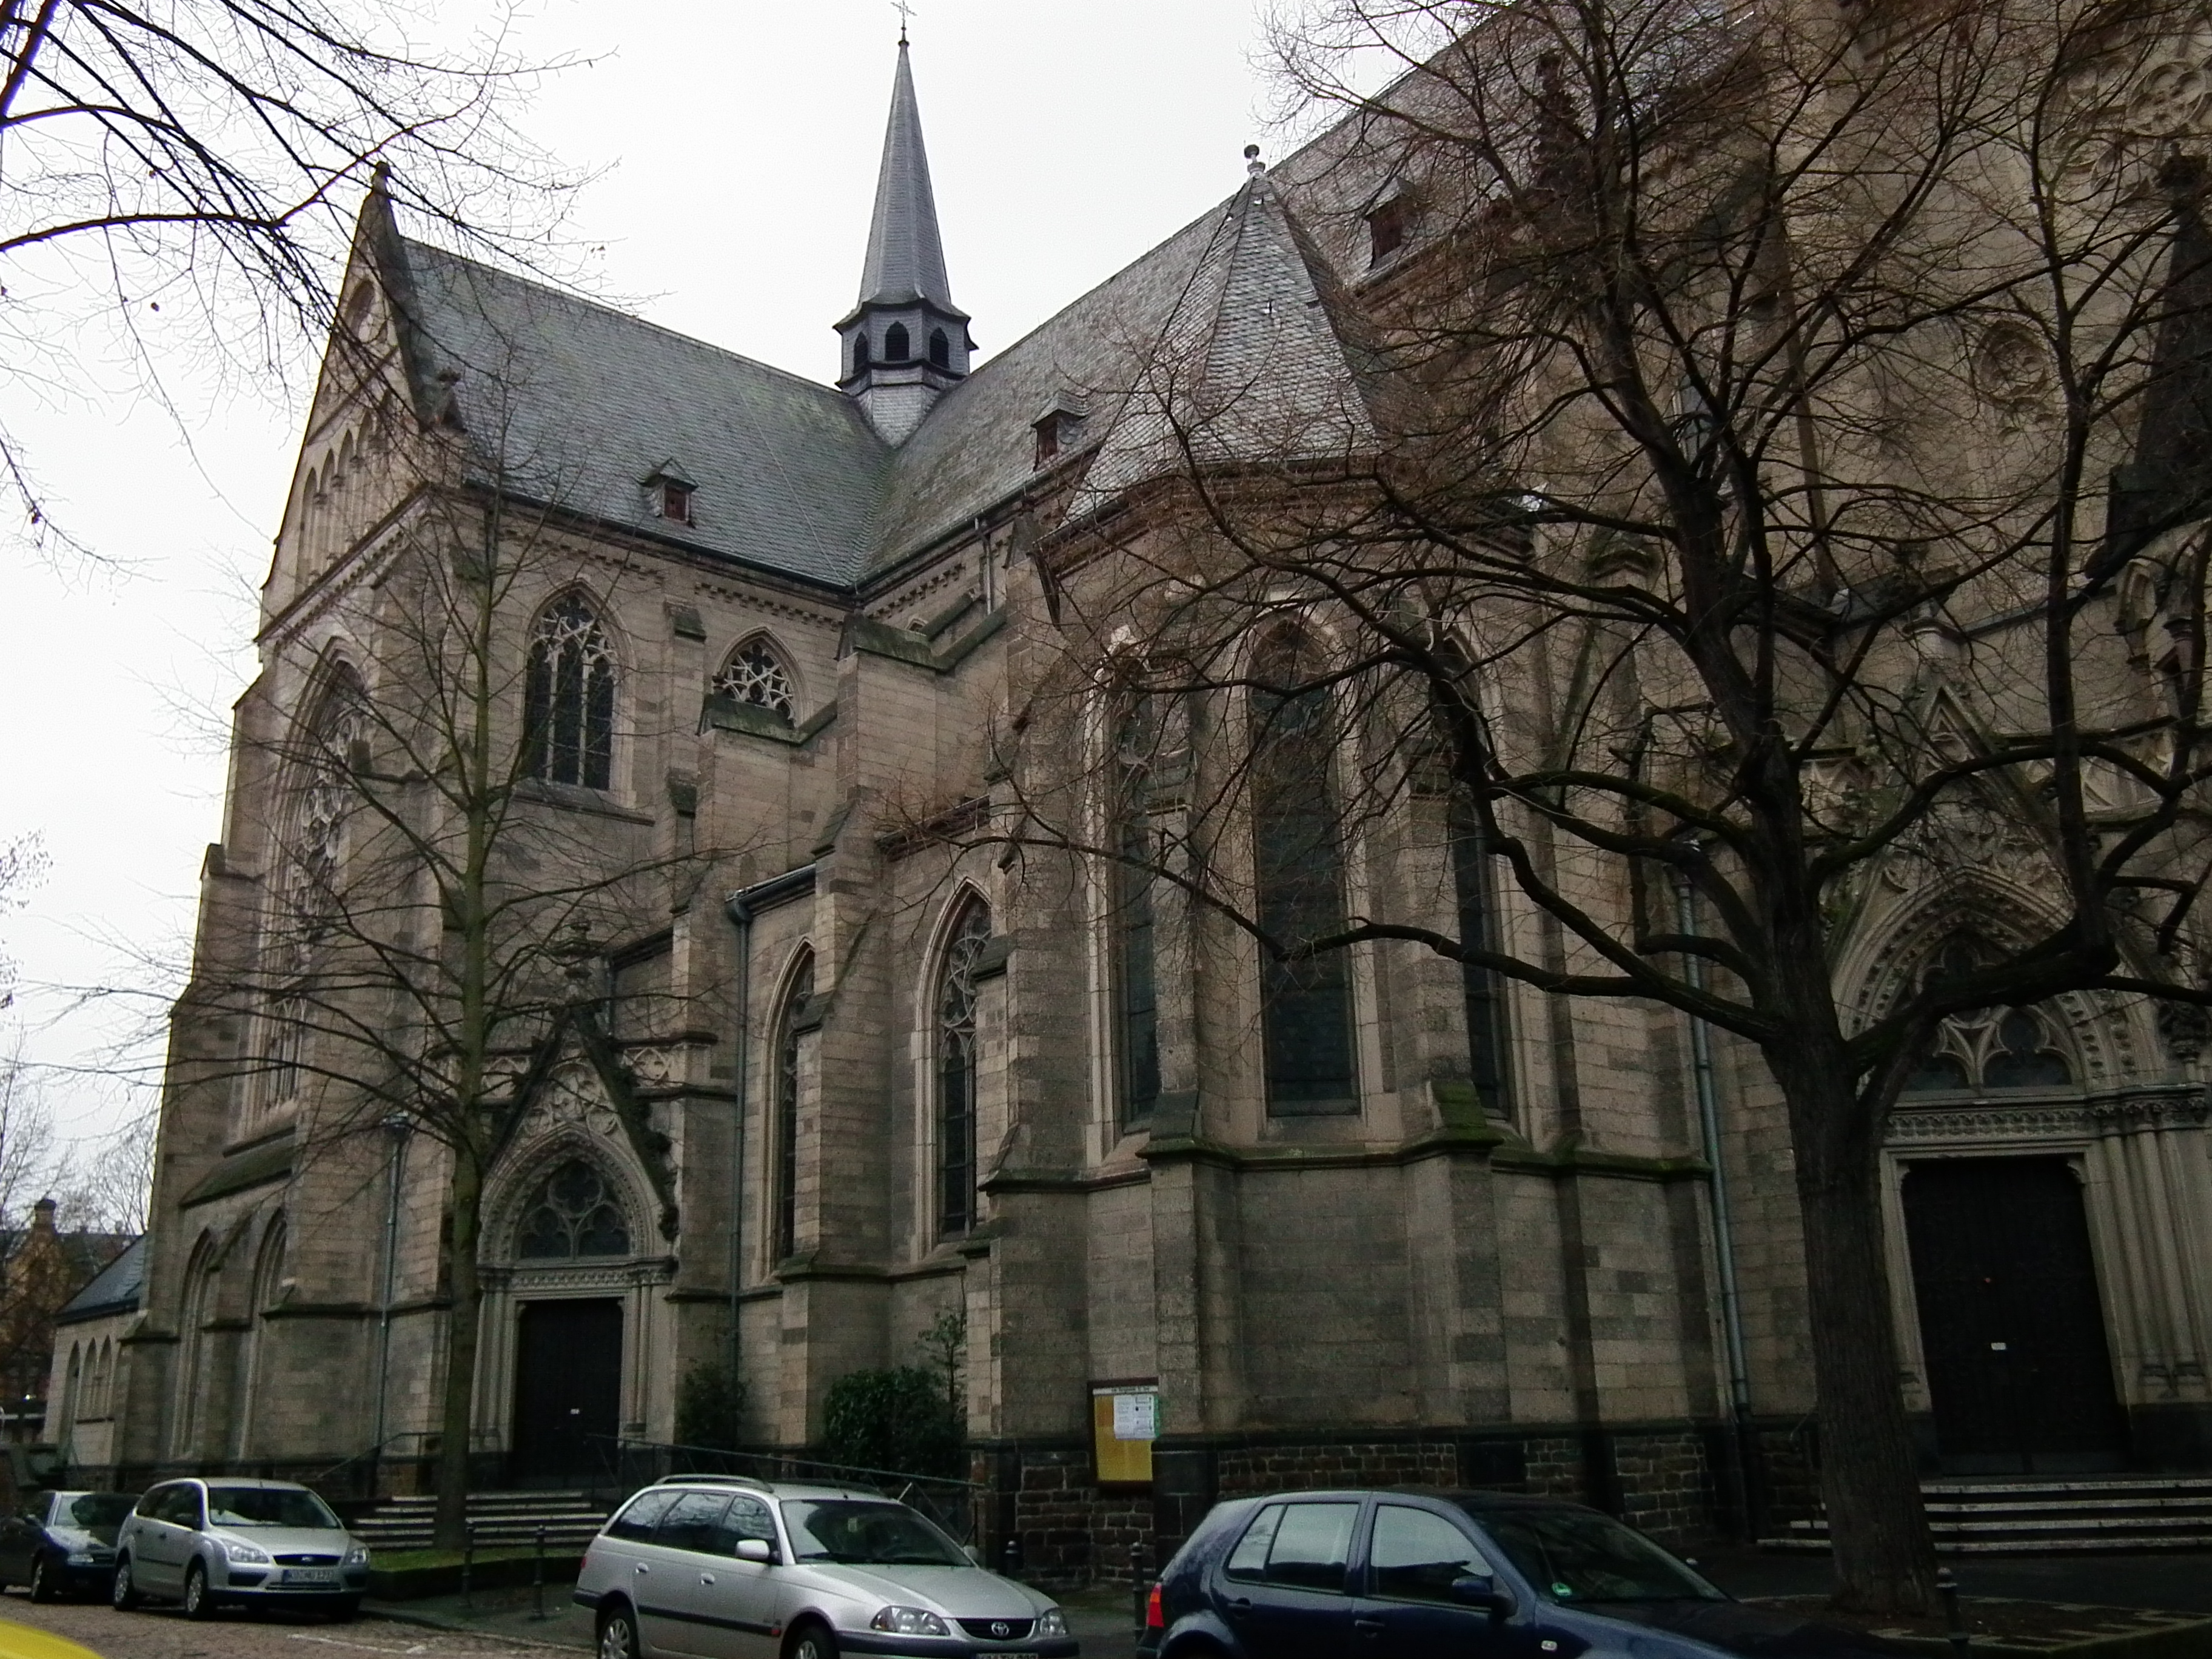 File:Katholische Kirche St Josef Koblenz.JPG - Wikimedia